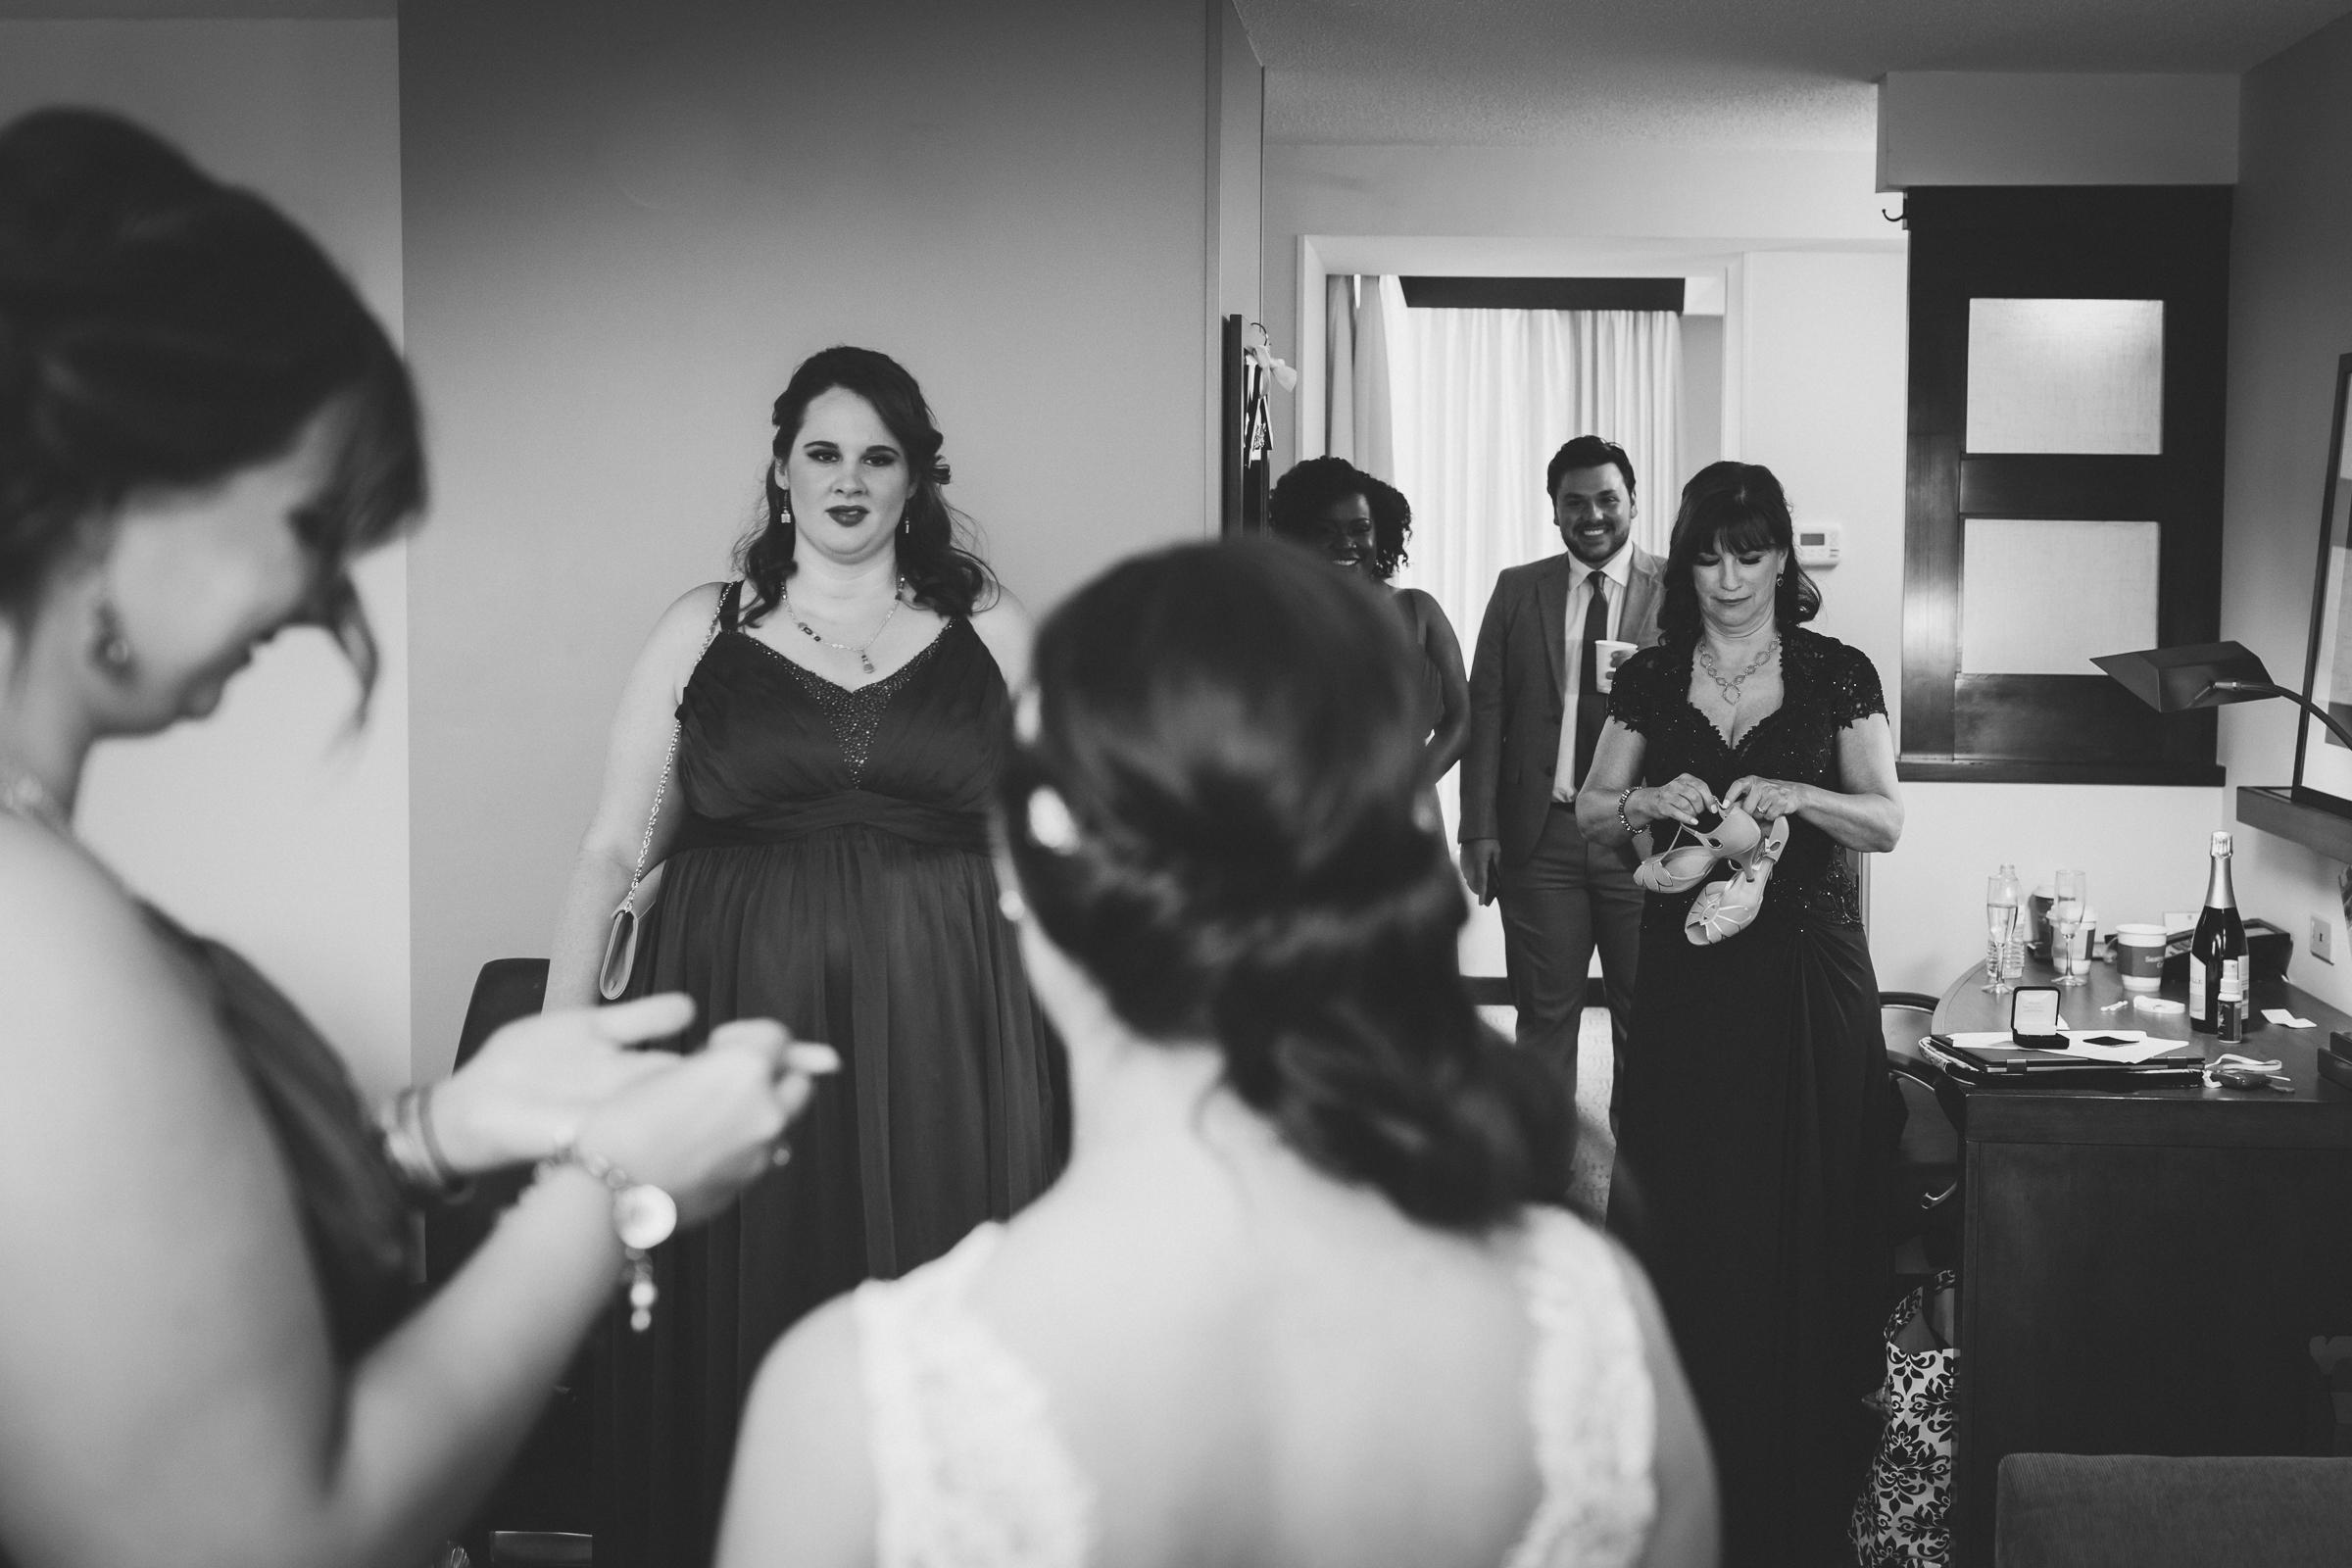 Martha-Clara-Vineyard-Long-Island-Documentary-Wedding-Photographer-10.jpg